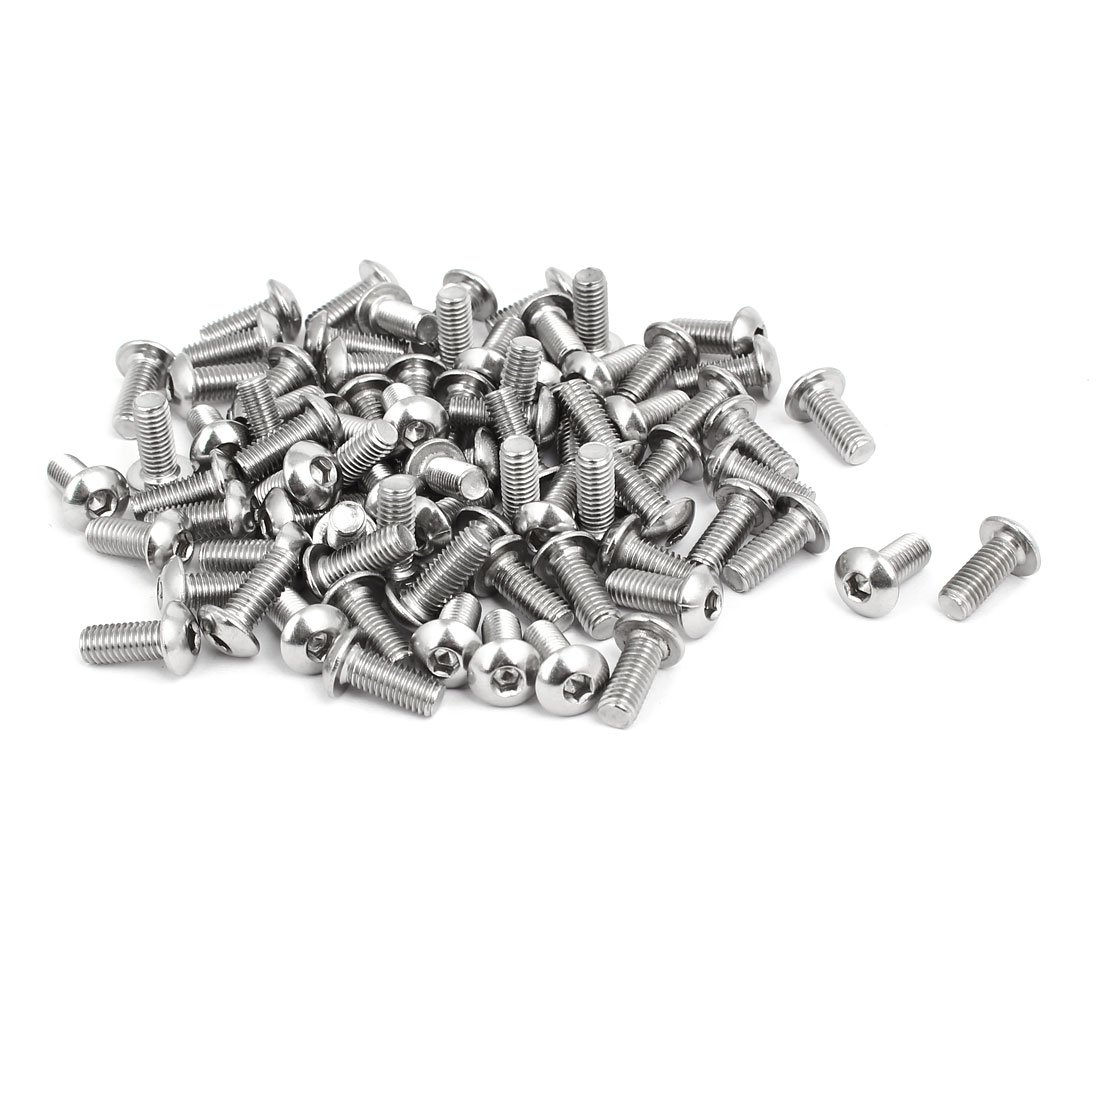 uxcell M5x12mm 304 Stainless Steel Button Head Hex Socket Cap Screws Bolts 80pcs